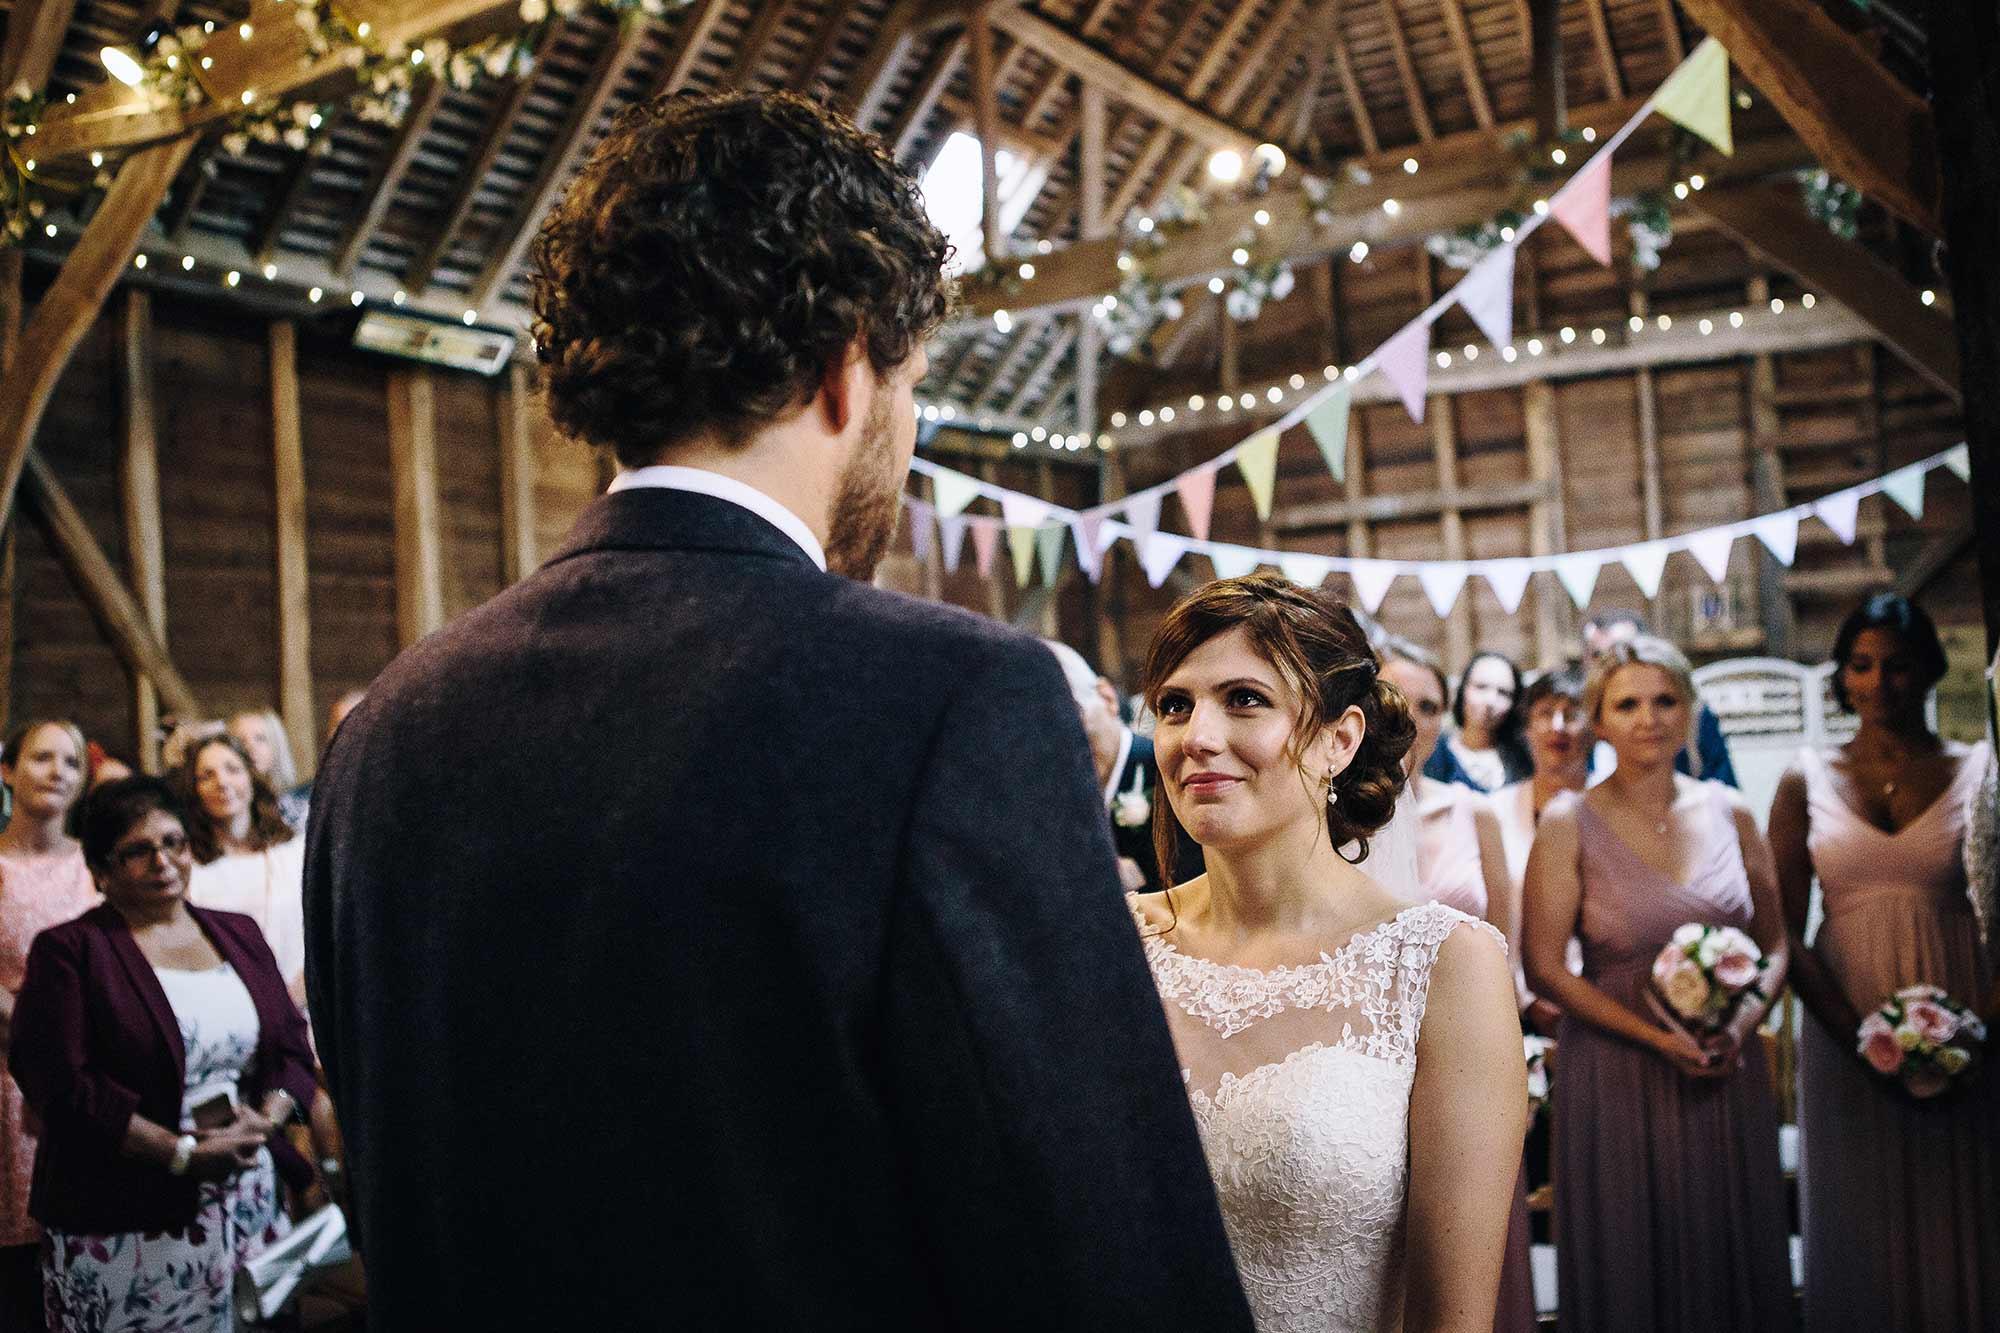 Wedding Ceremony at Herons Farm Barn